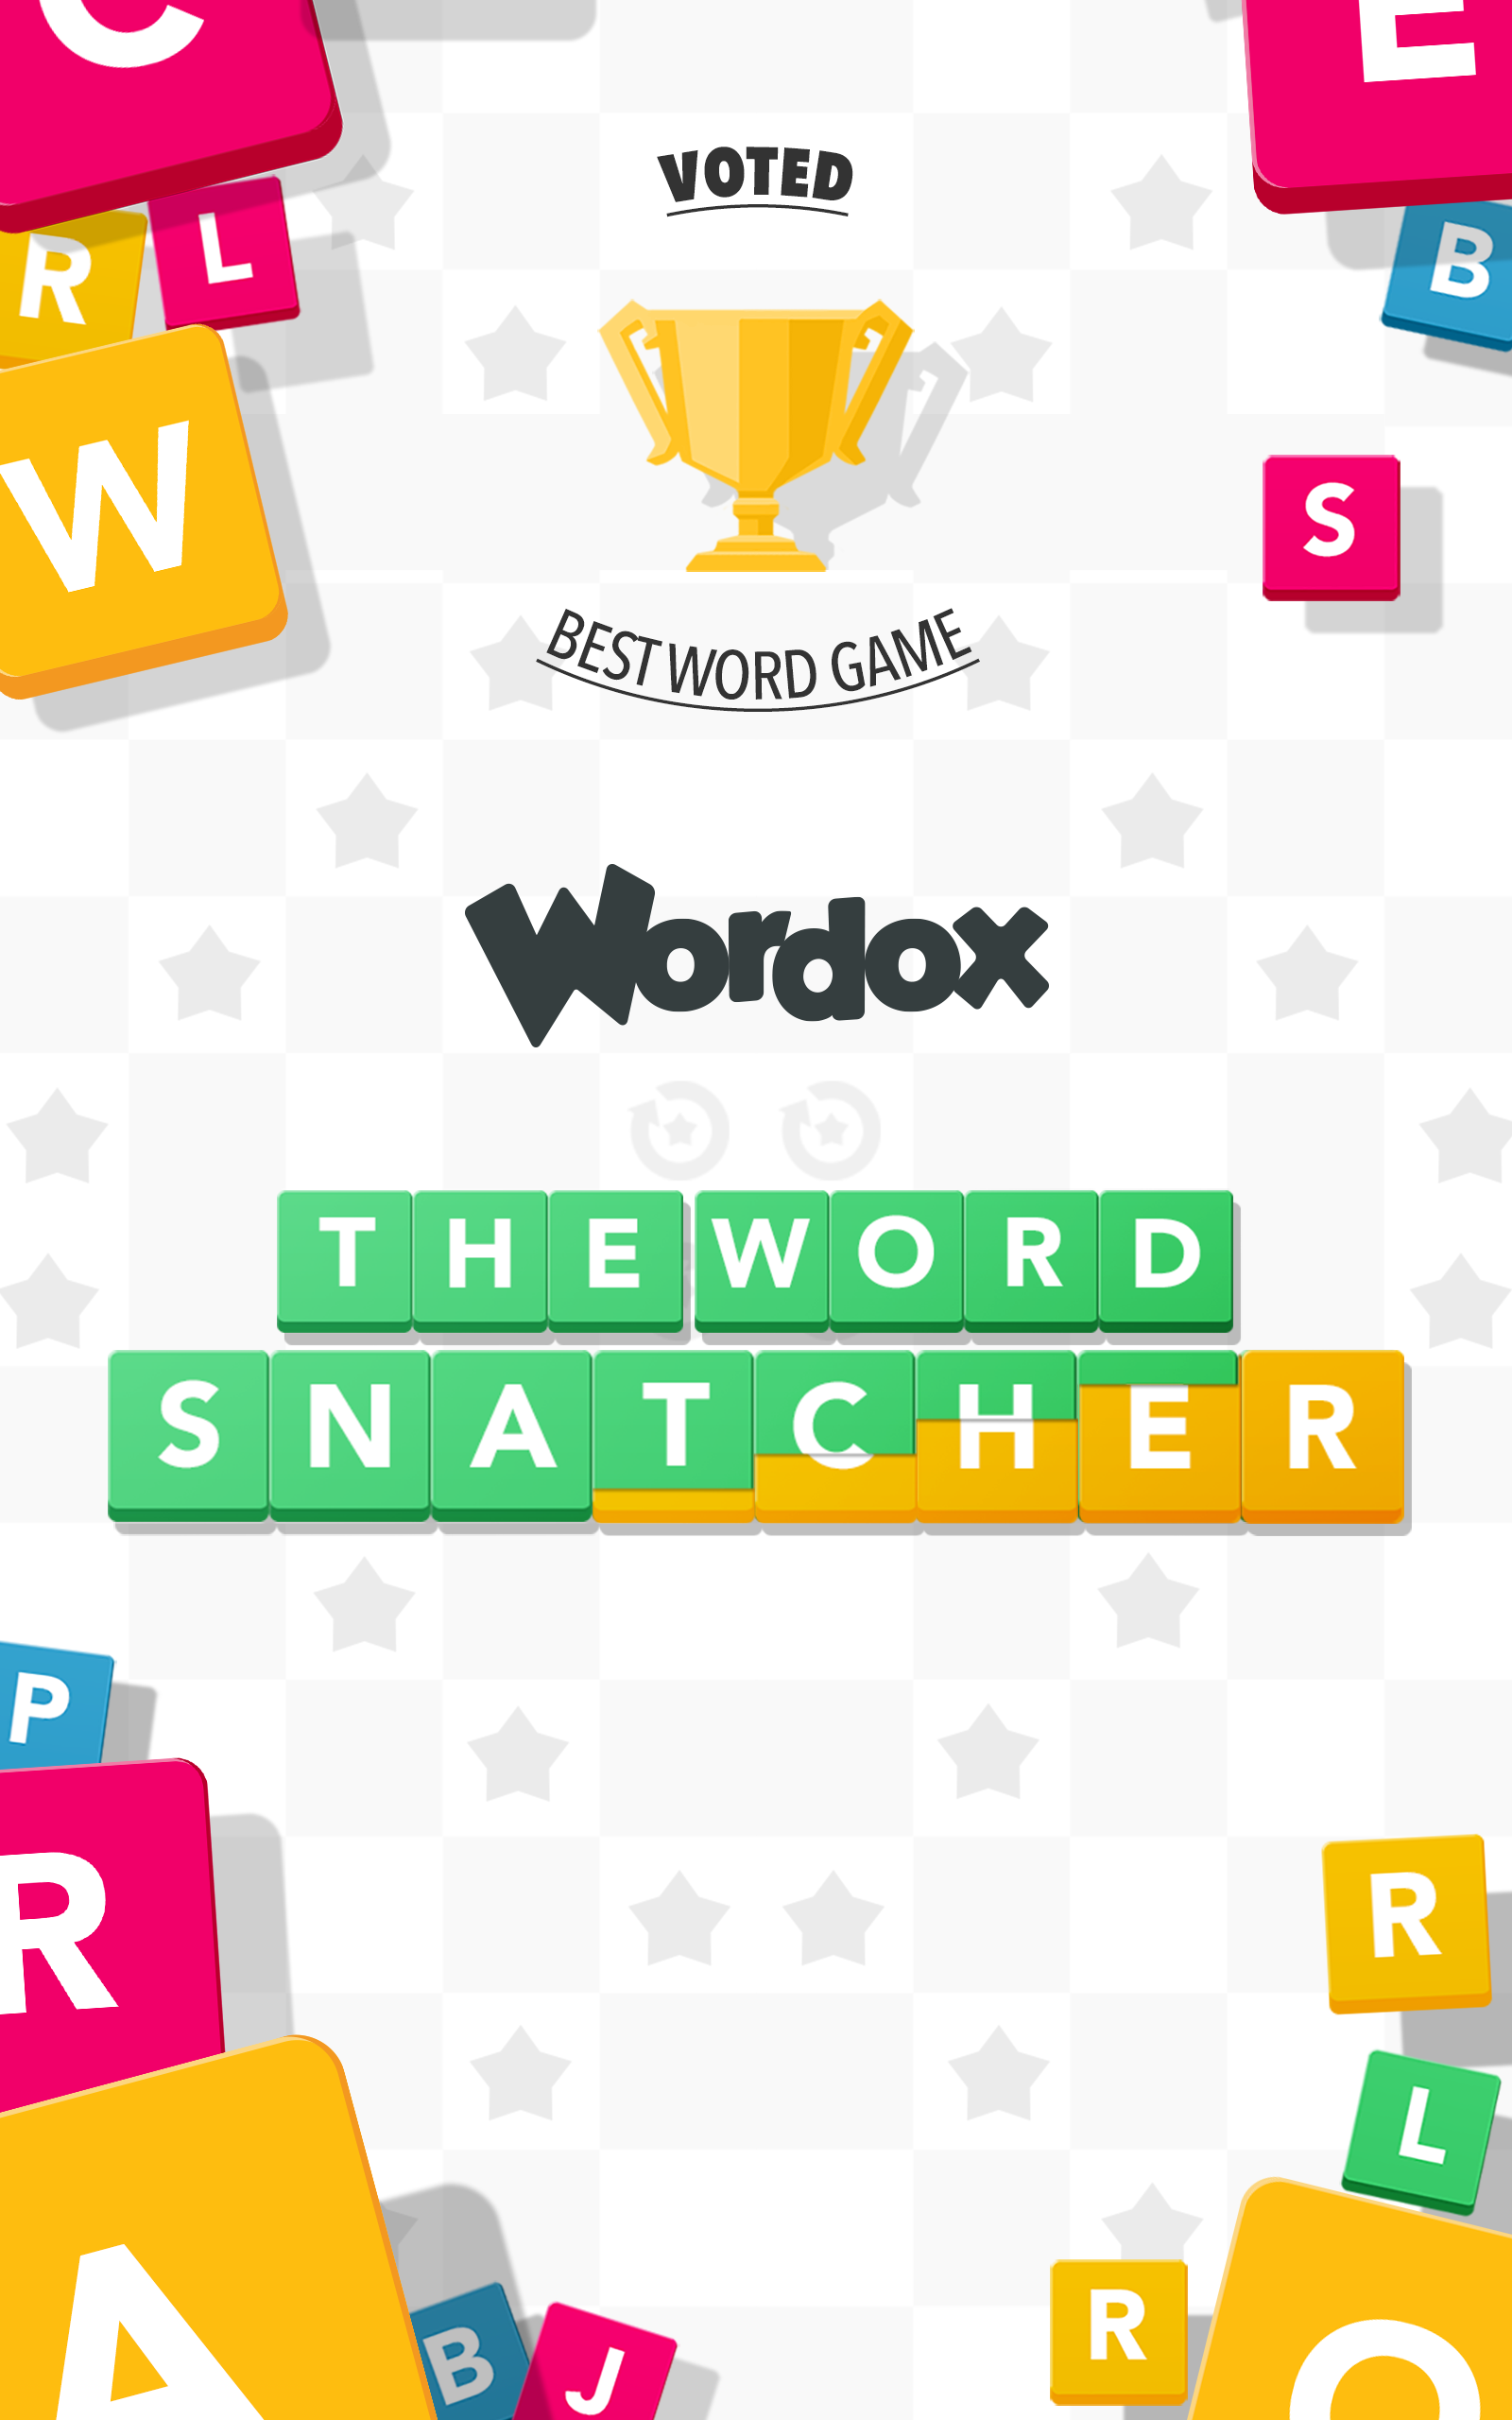 Wordox The Word Snatcher screenshot #11